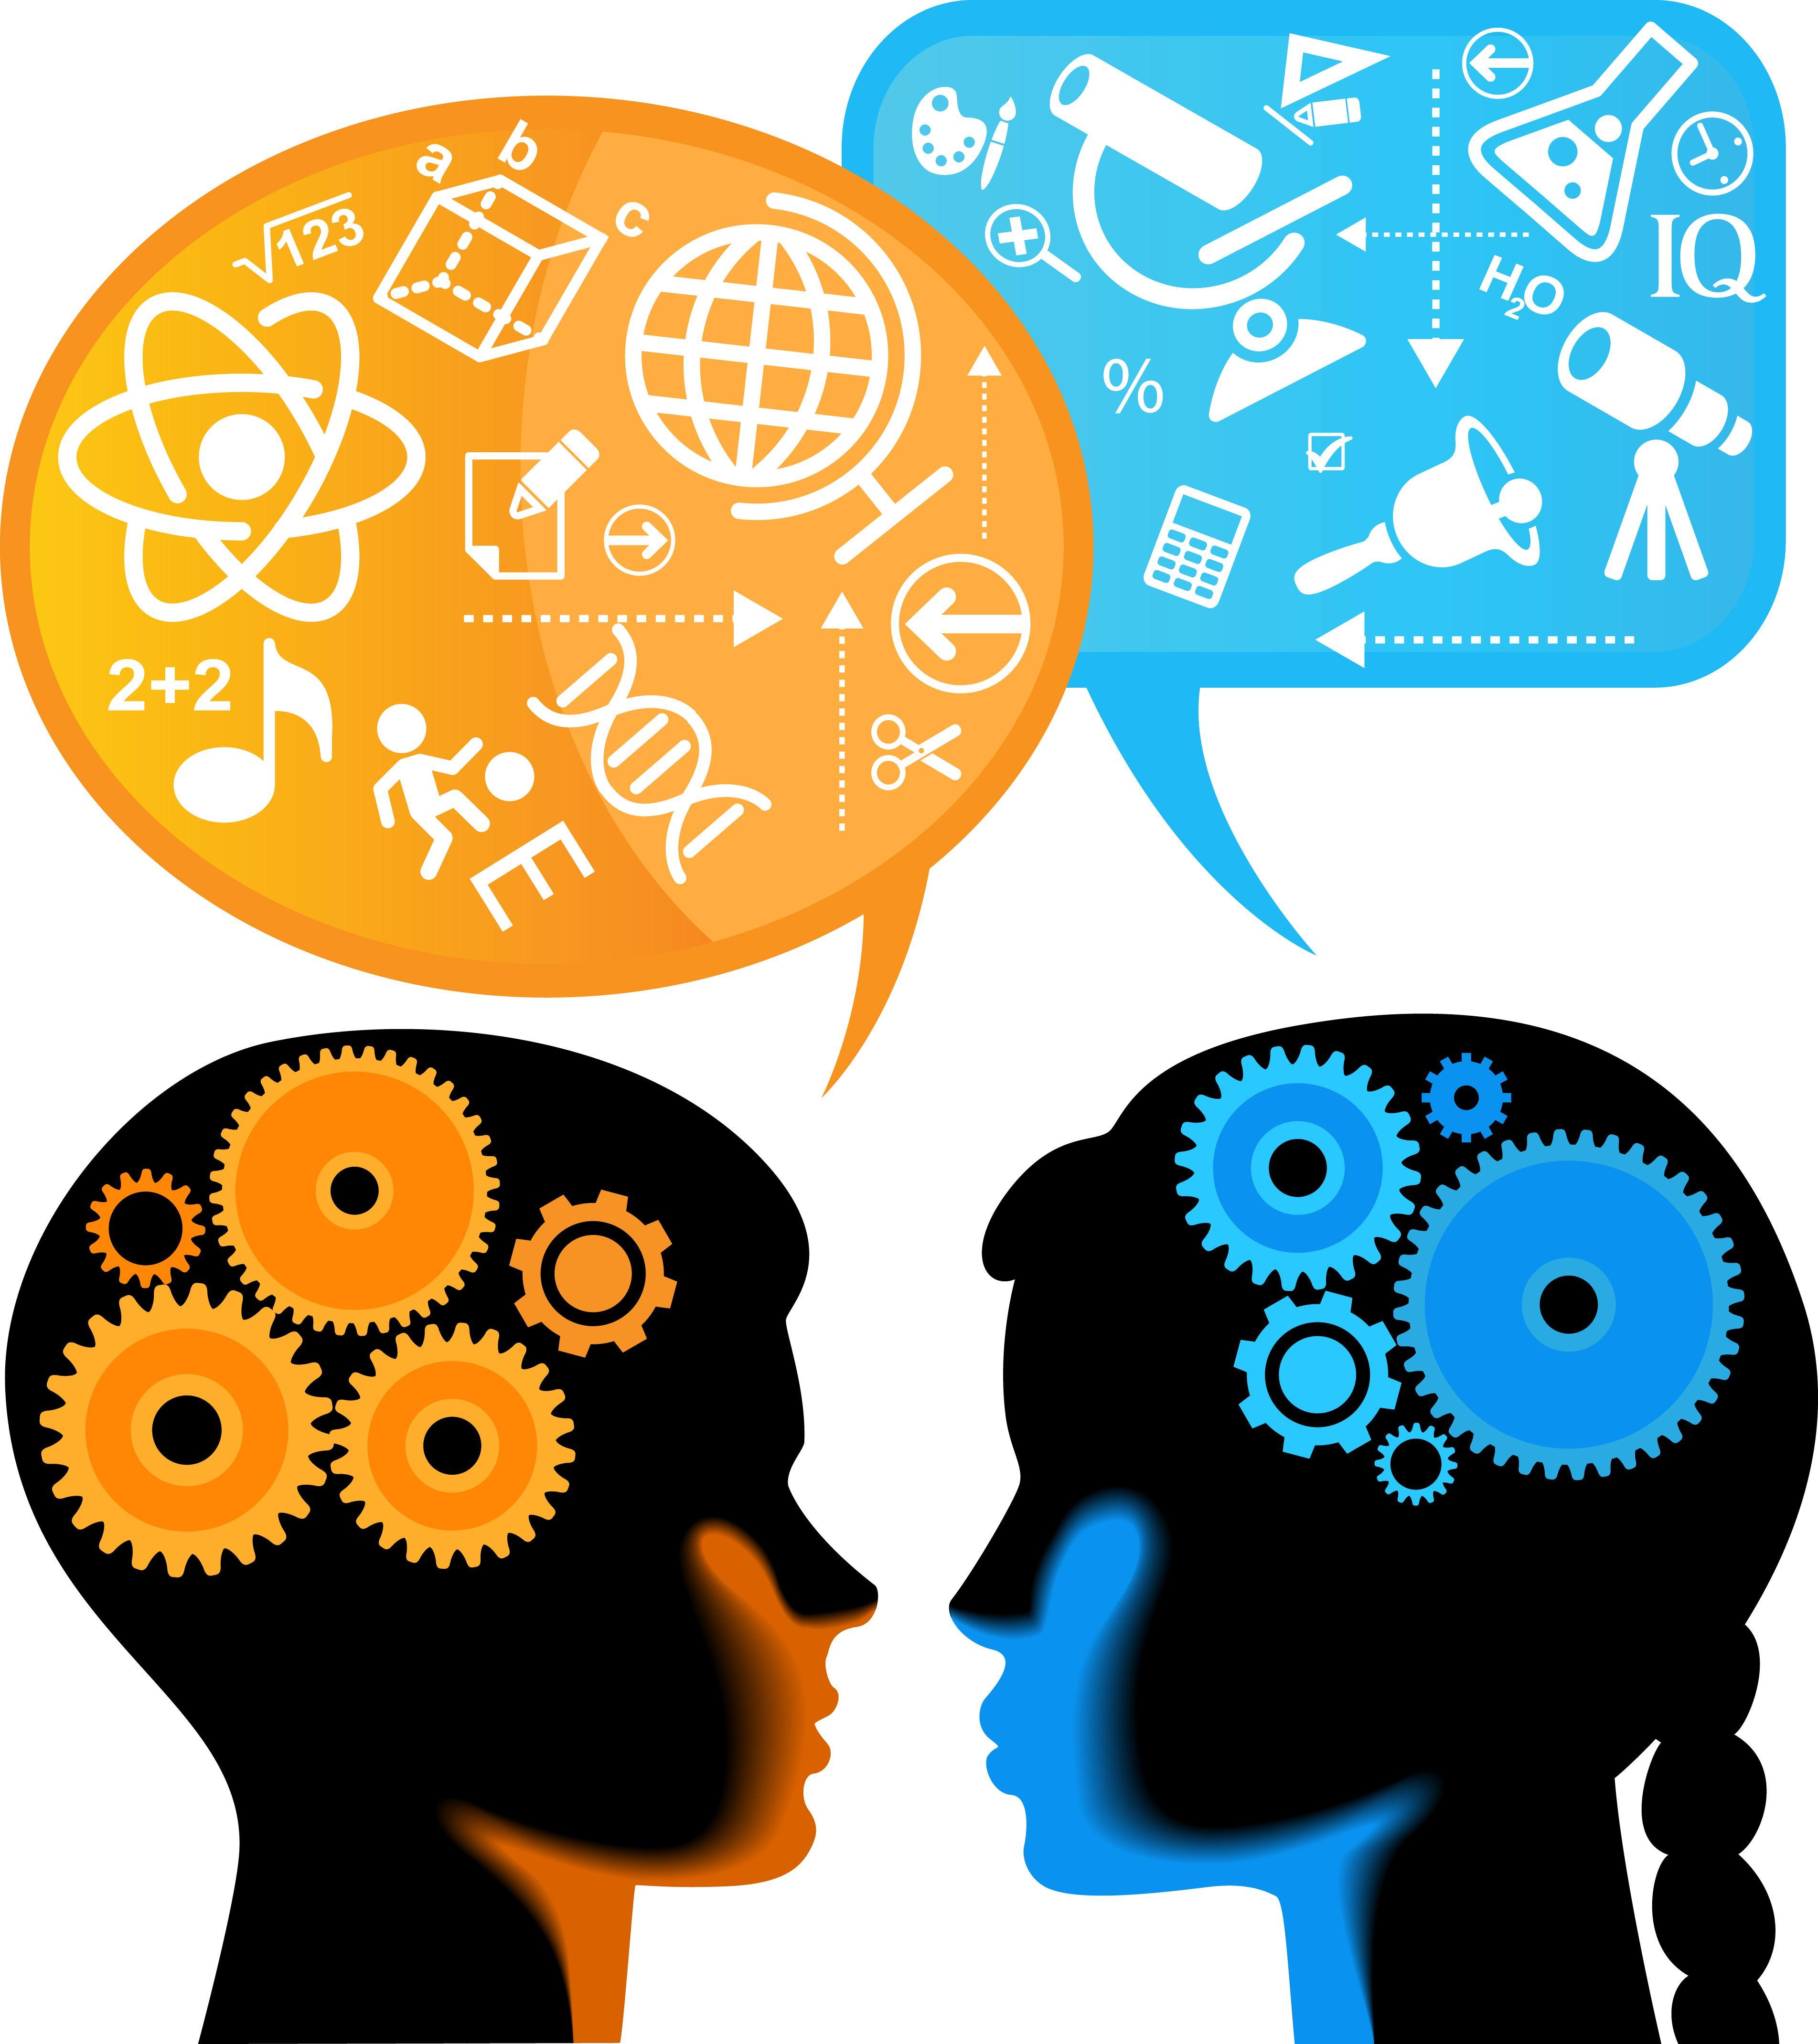 Train To Speak | Public speaking, Workbook, Debate